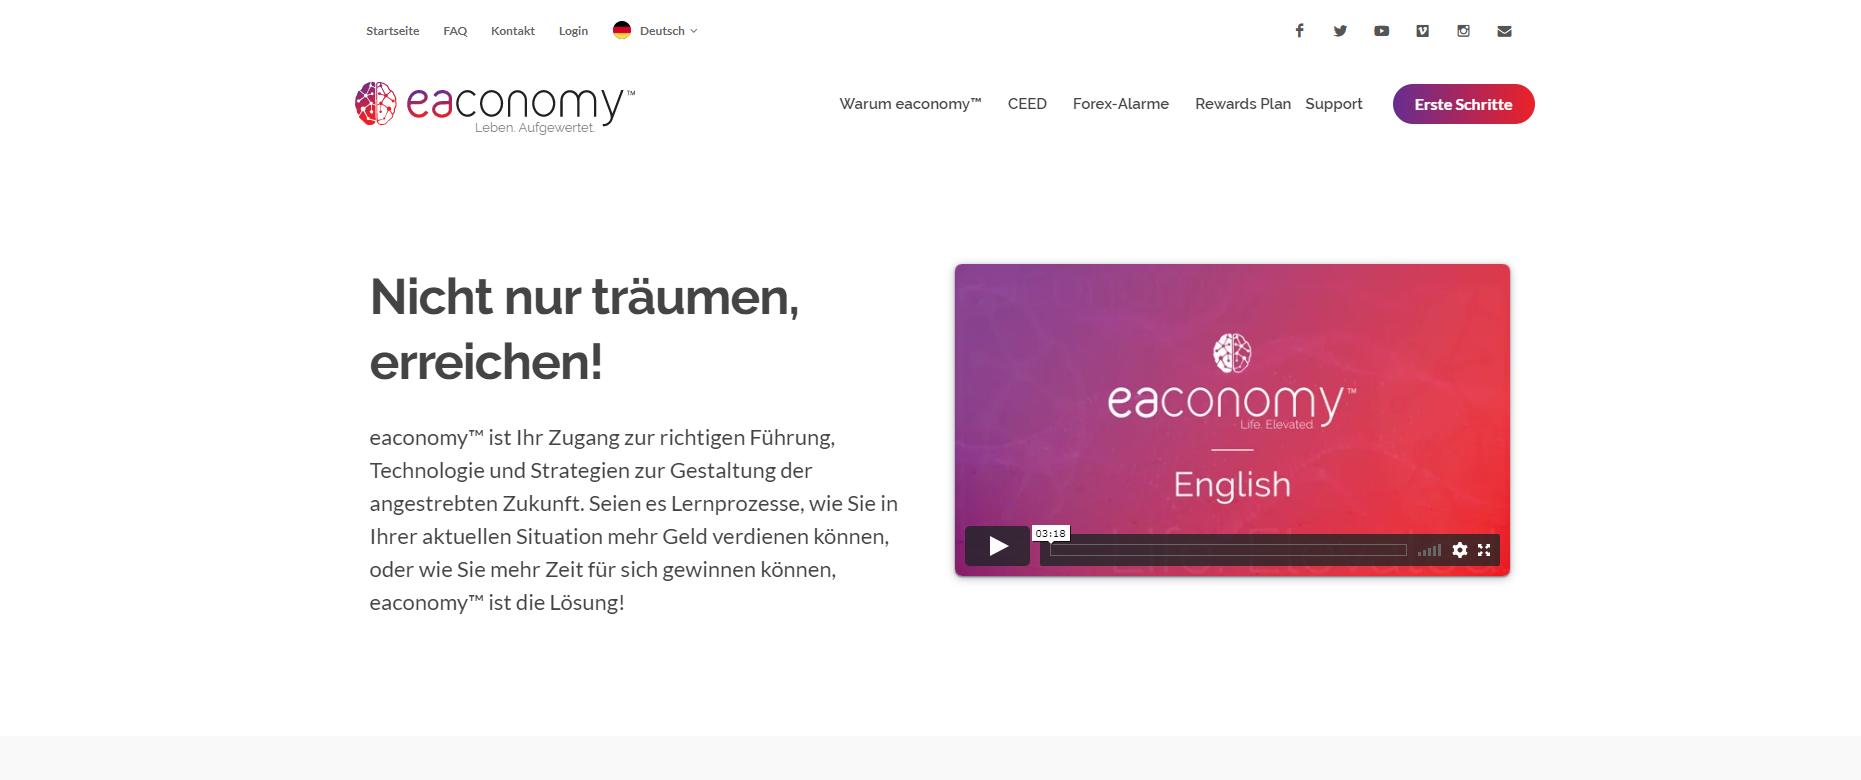 eaconomy Webseite (Screenshot)